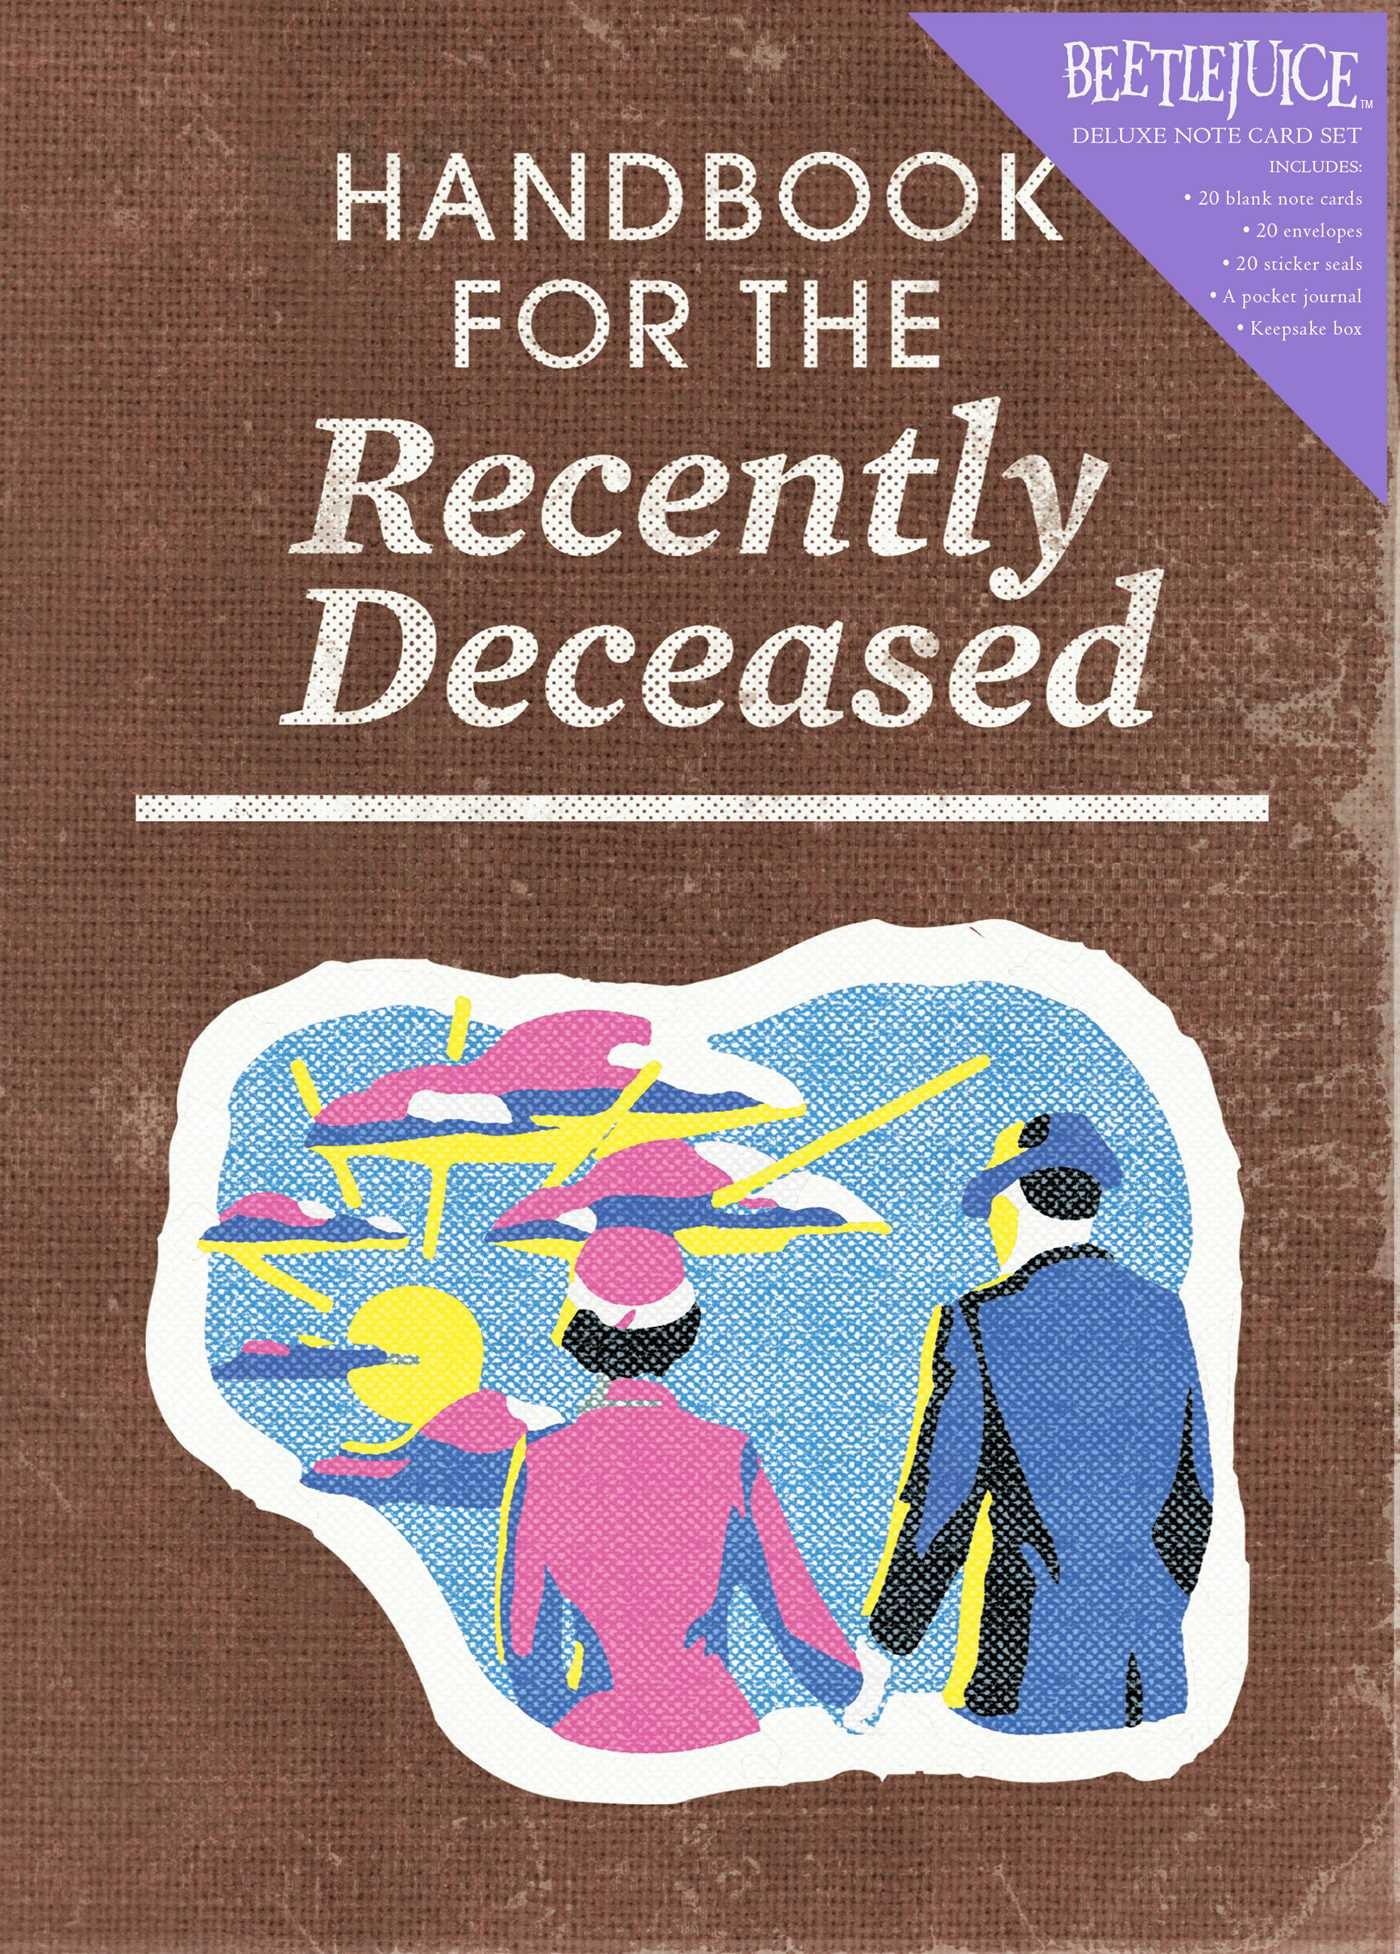 Beetlejuice handbook for the recently deceased deluxe note card set with keepsake book box 9781683833406.in01